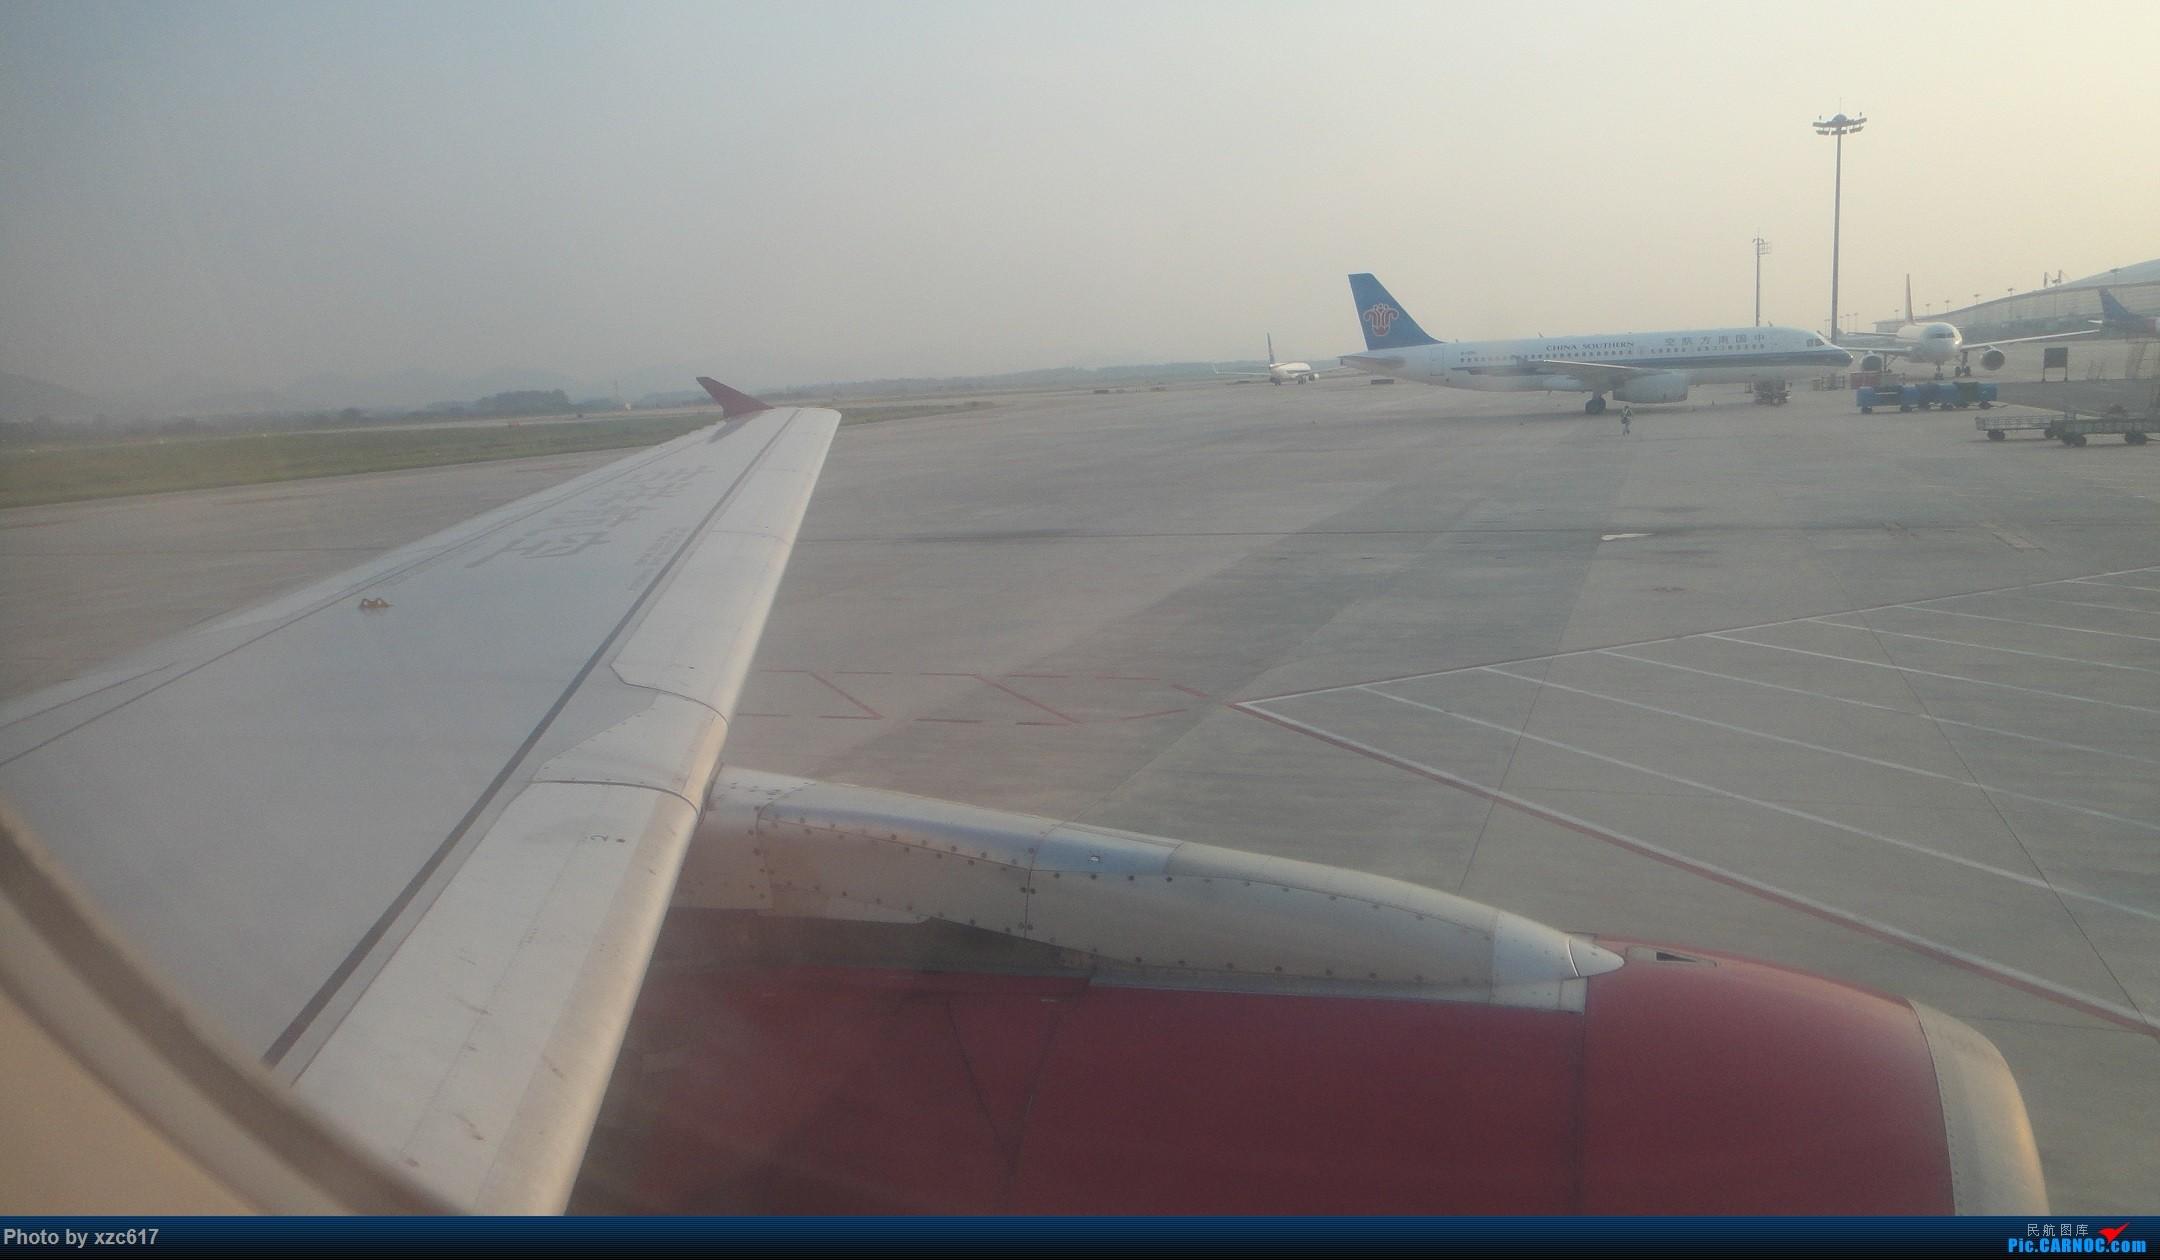 Re:[原创]xzc617的飞行游记 NO.1 由扬州到大连,平生第一次游海岛 AIRBUS A319 不详 中国南京禄口国际机场